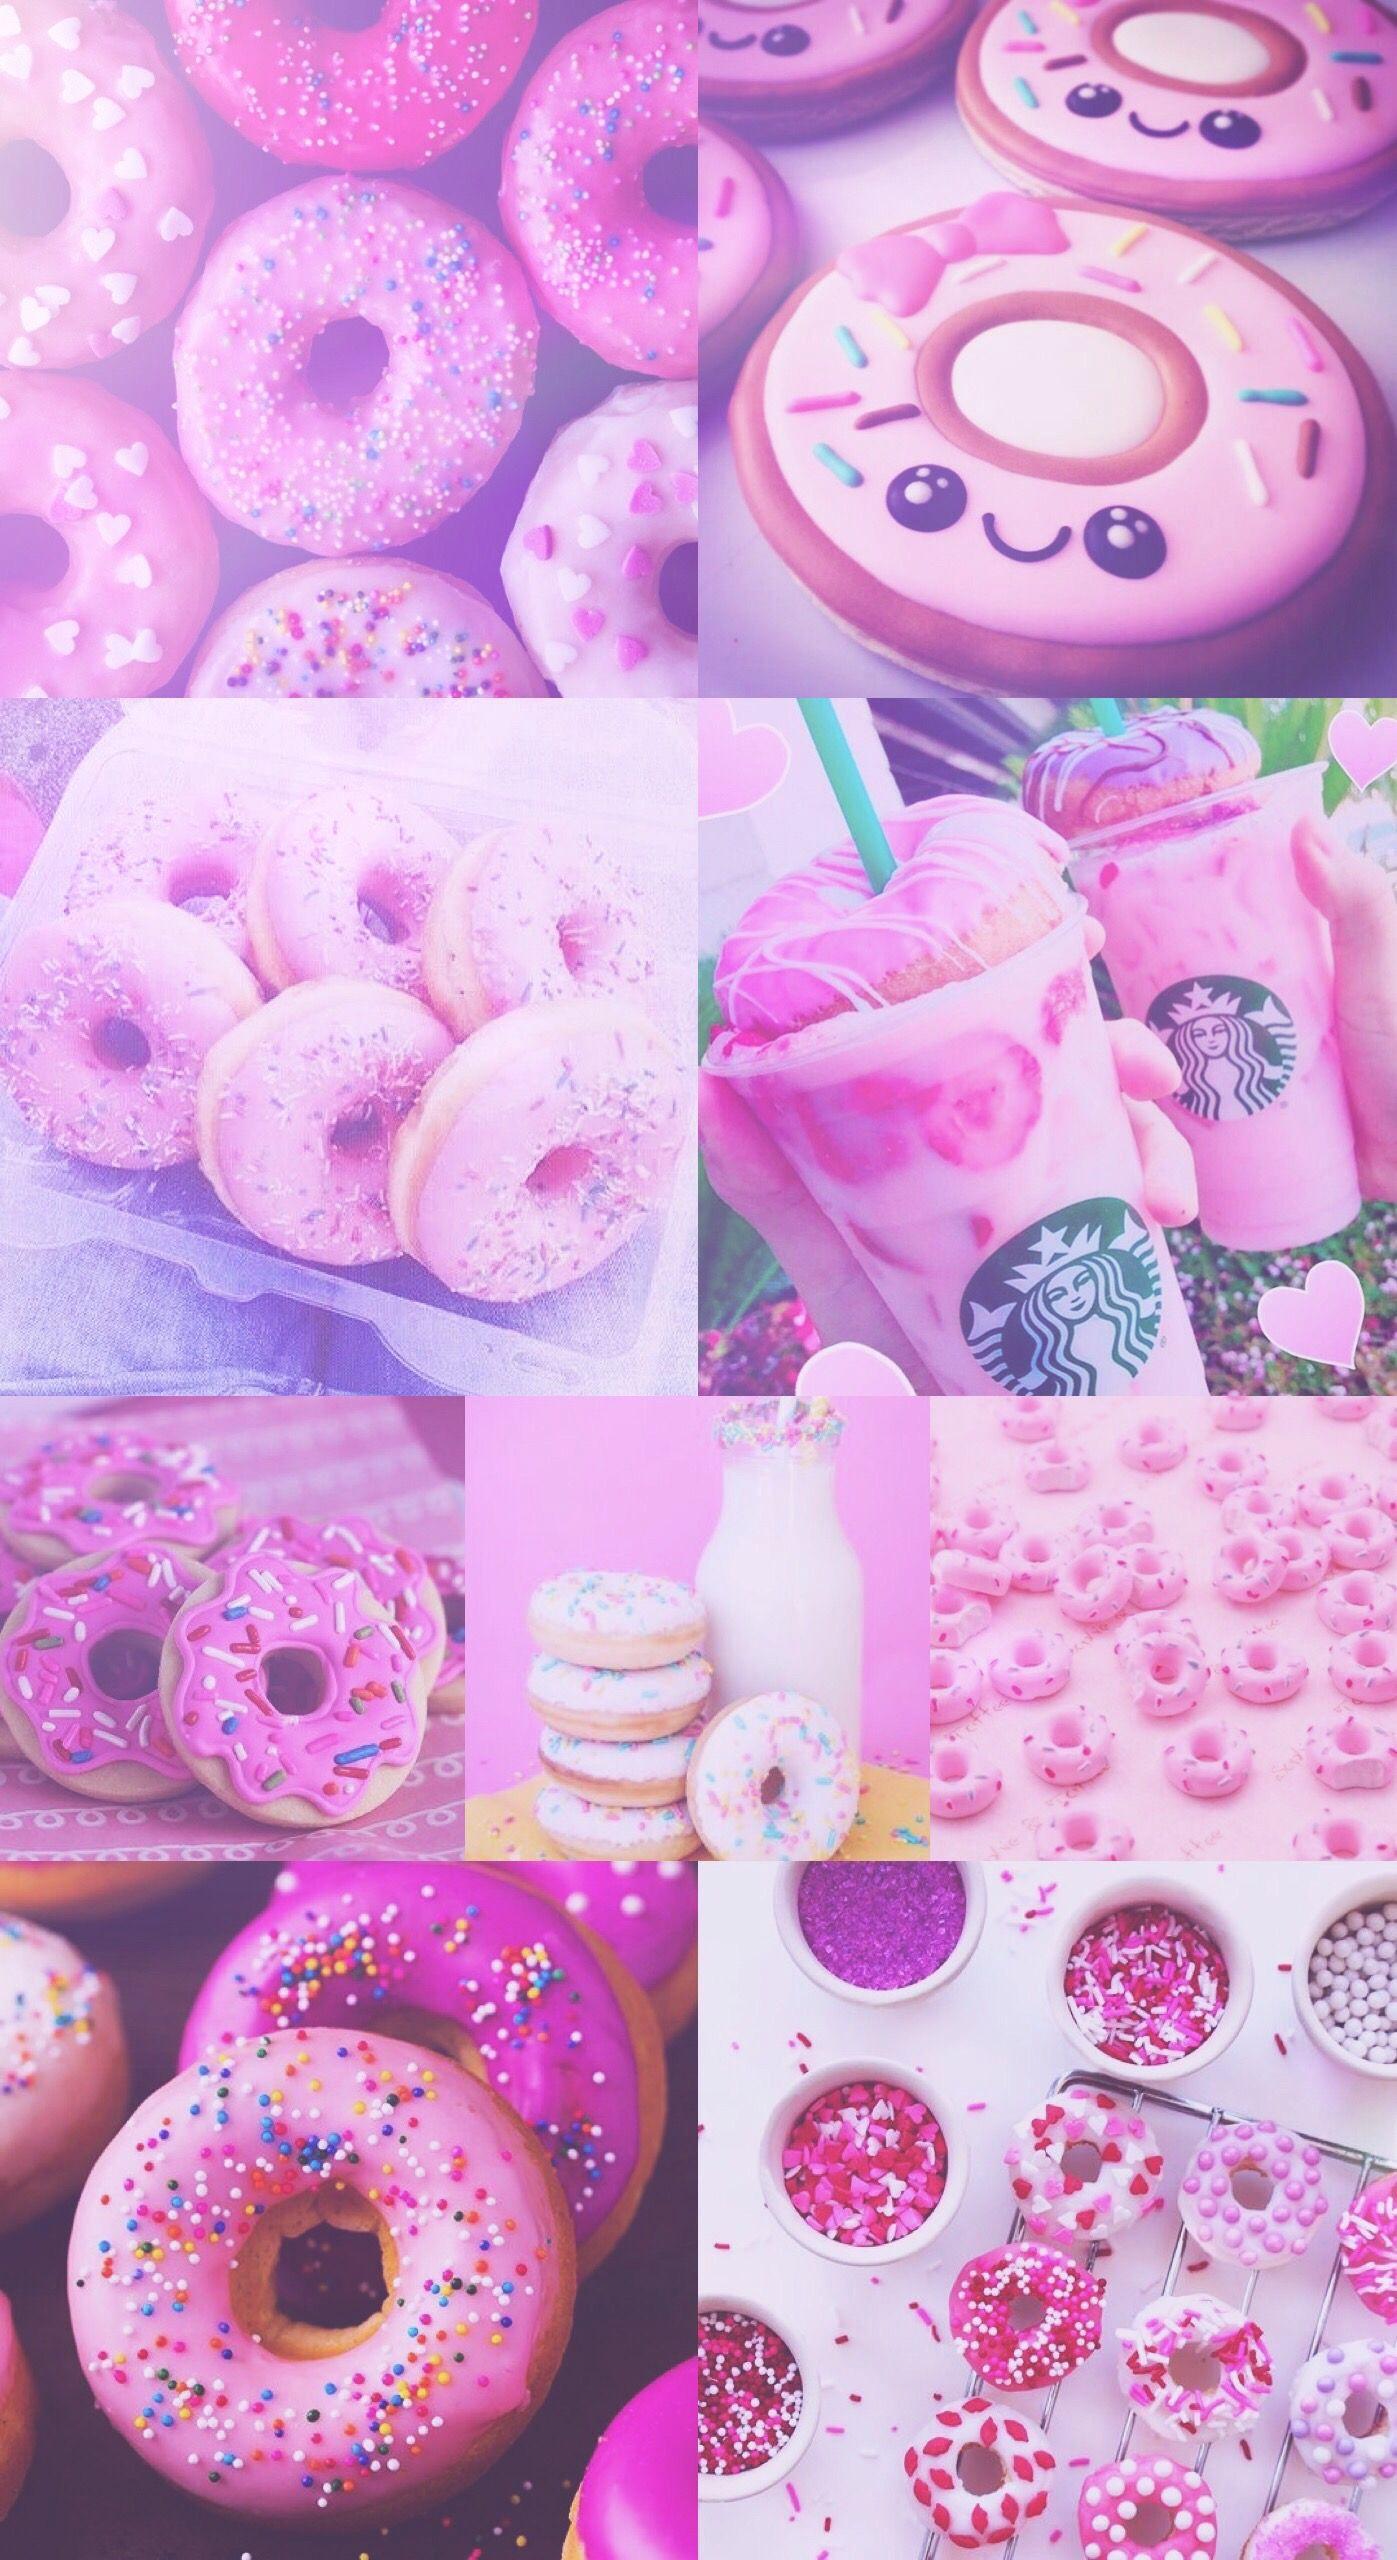 Res: 1397x2560, iPhone 5 Wallpaper Violet Donut Donuts Pink Purple Pretty Starbucks  Wallpaper Hd Of iPhone 5 Wallpaper